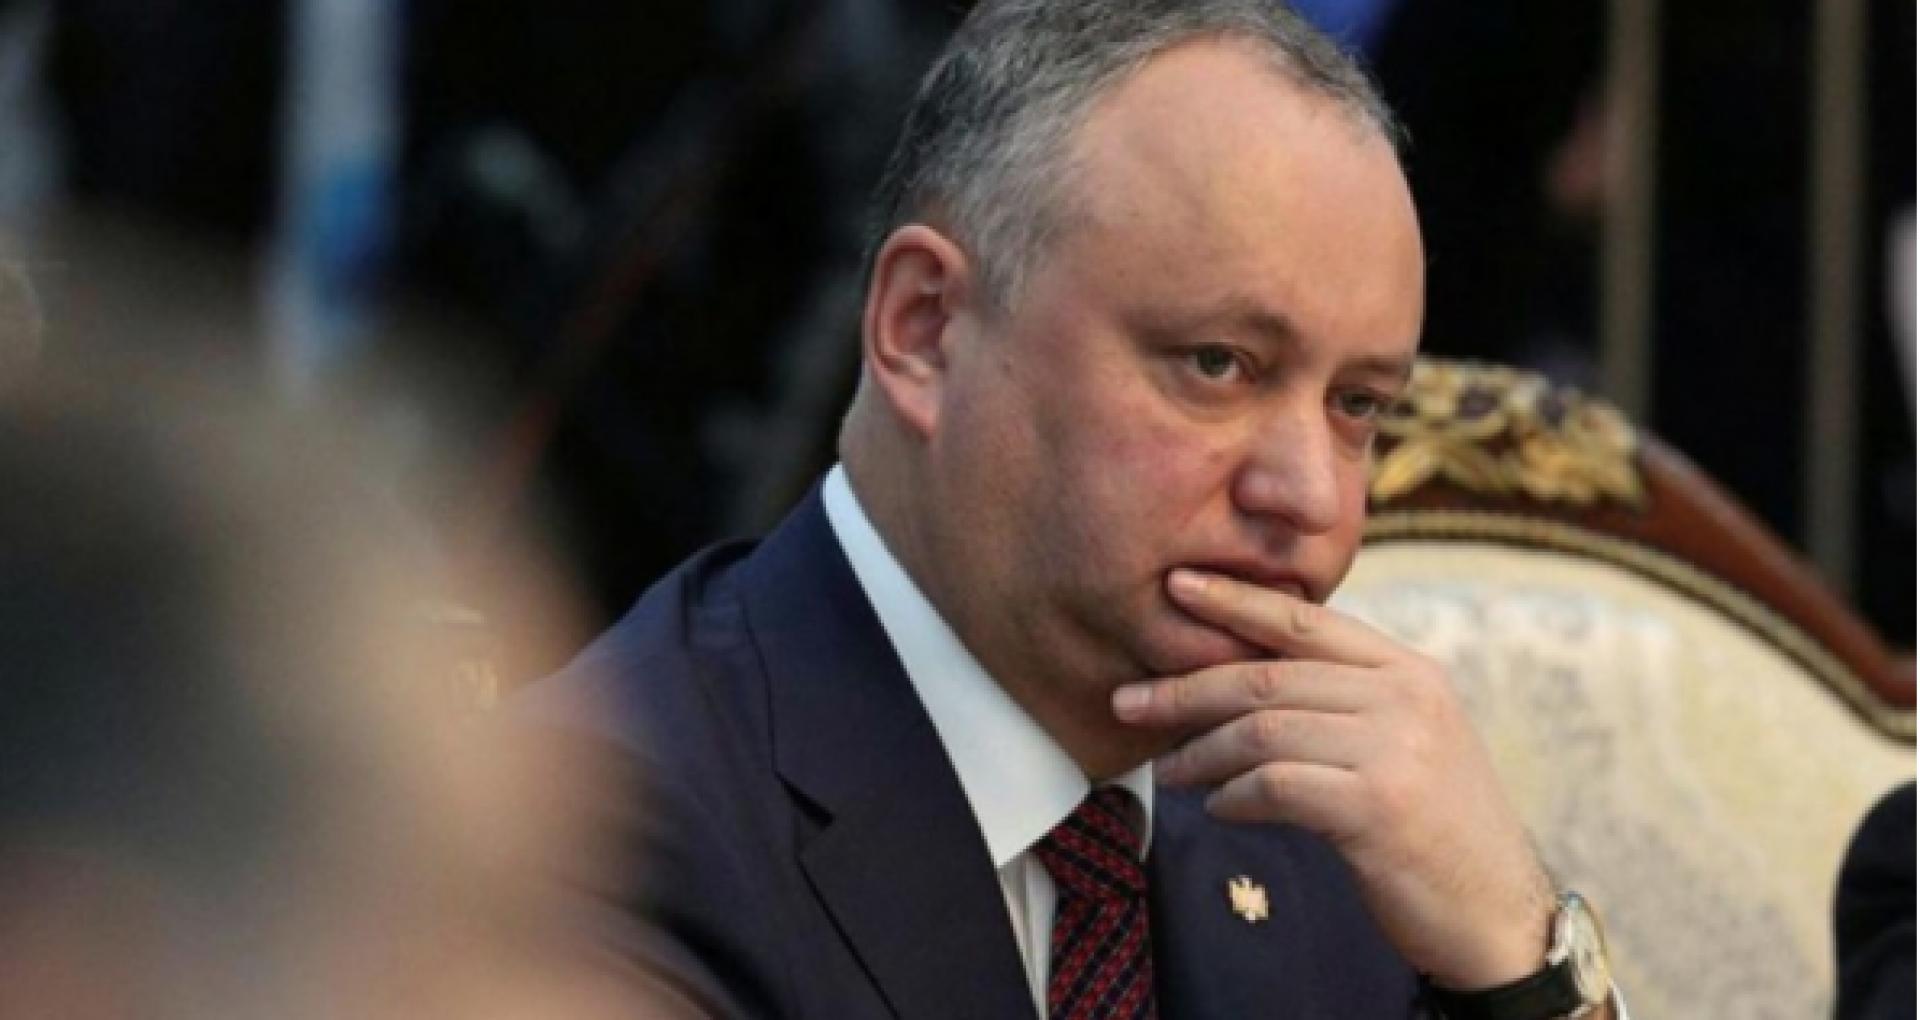 German Press: Kremlin has Invested 11.453 Million Euros to Help Igor Dodon in Presidential Campaign